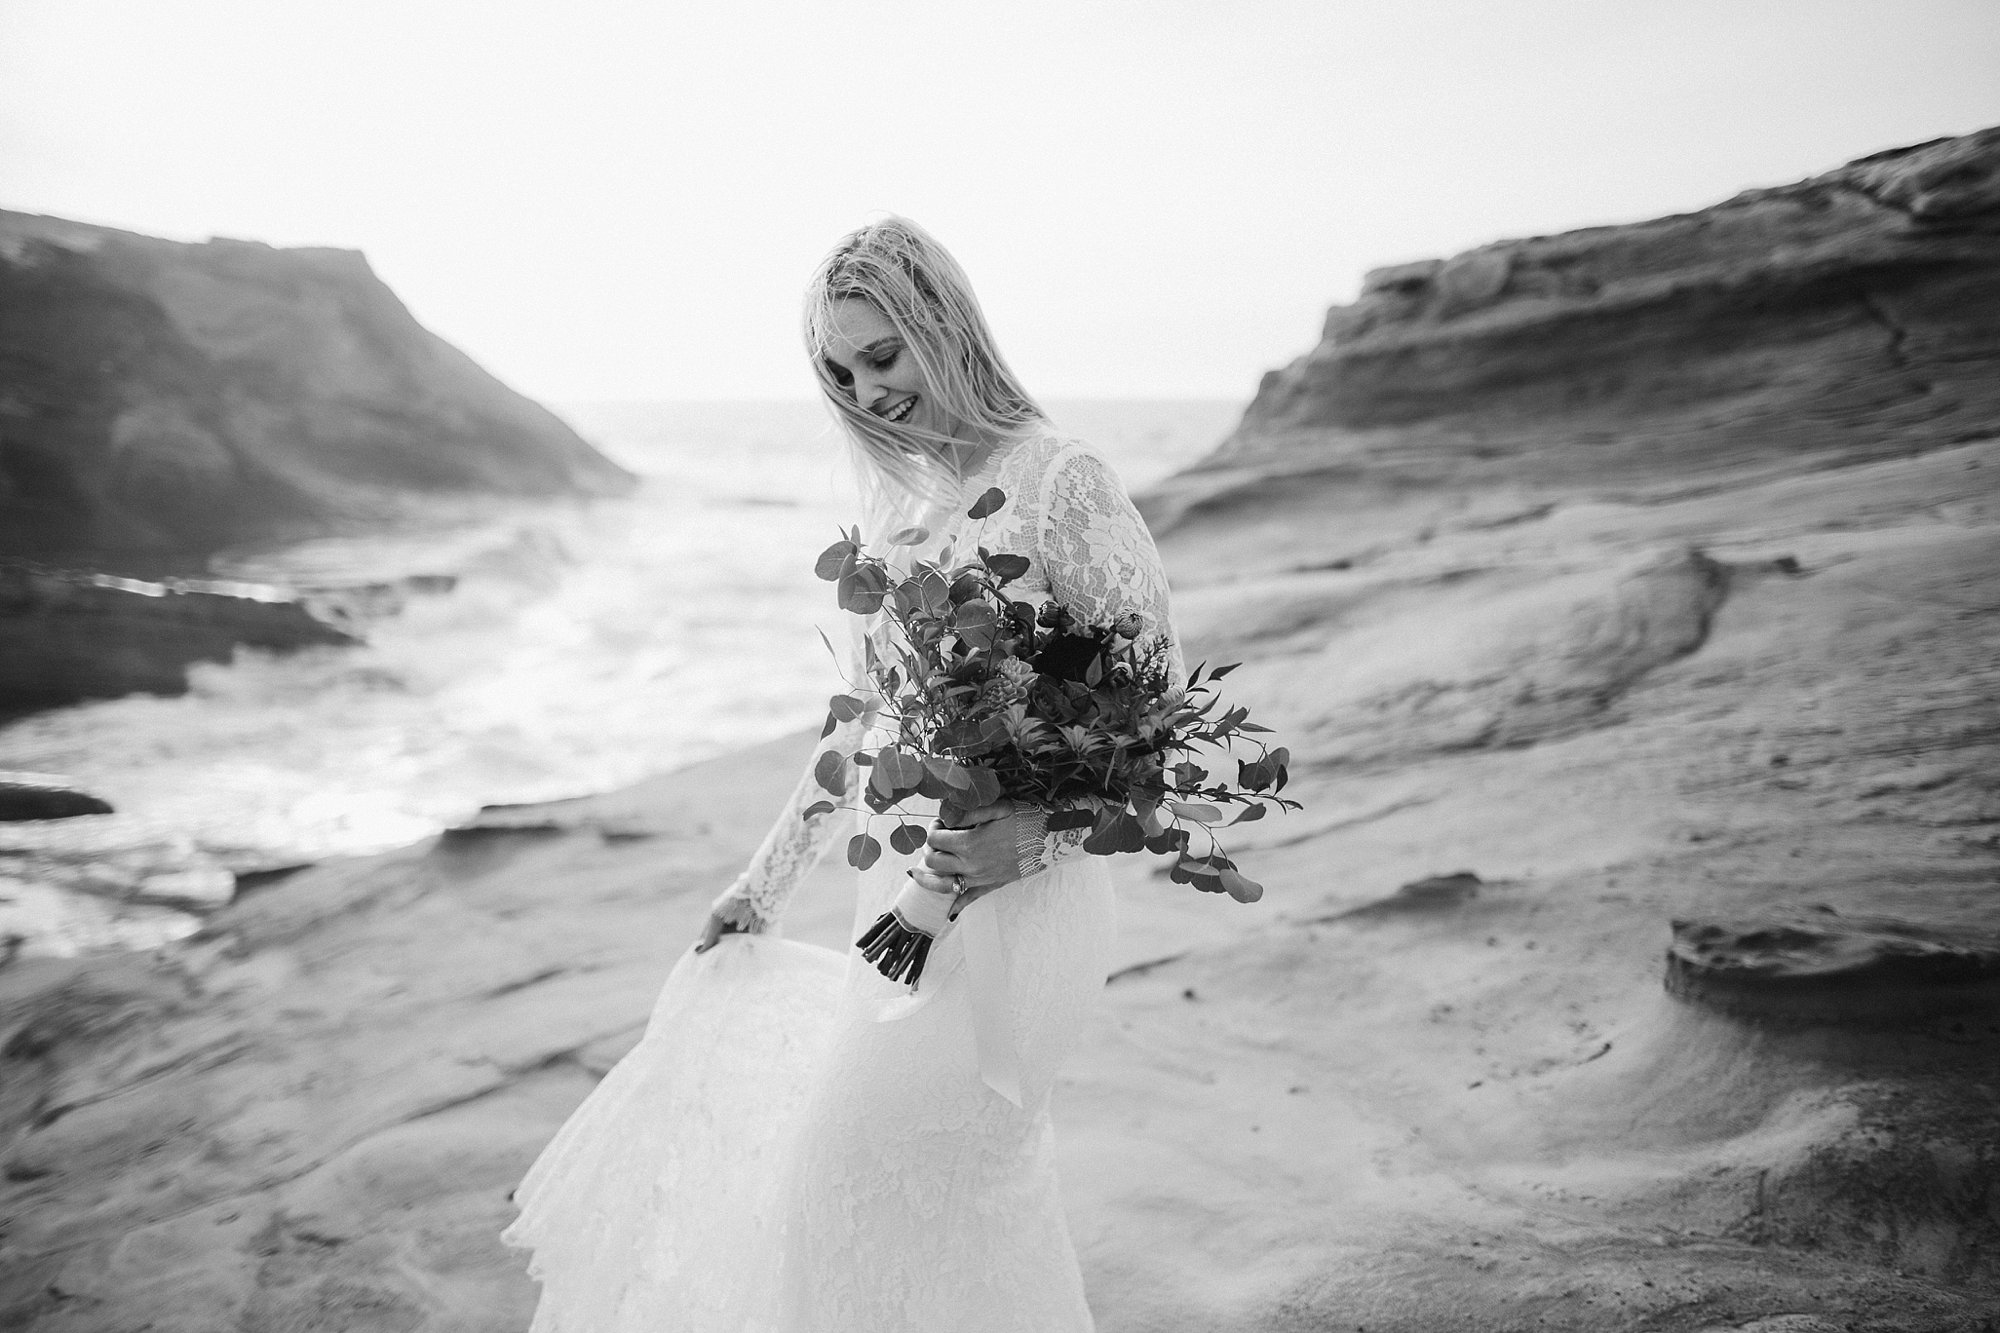 cape-kiwanda-elopement-wedding_0014.jpg